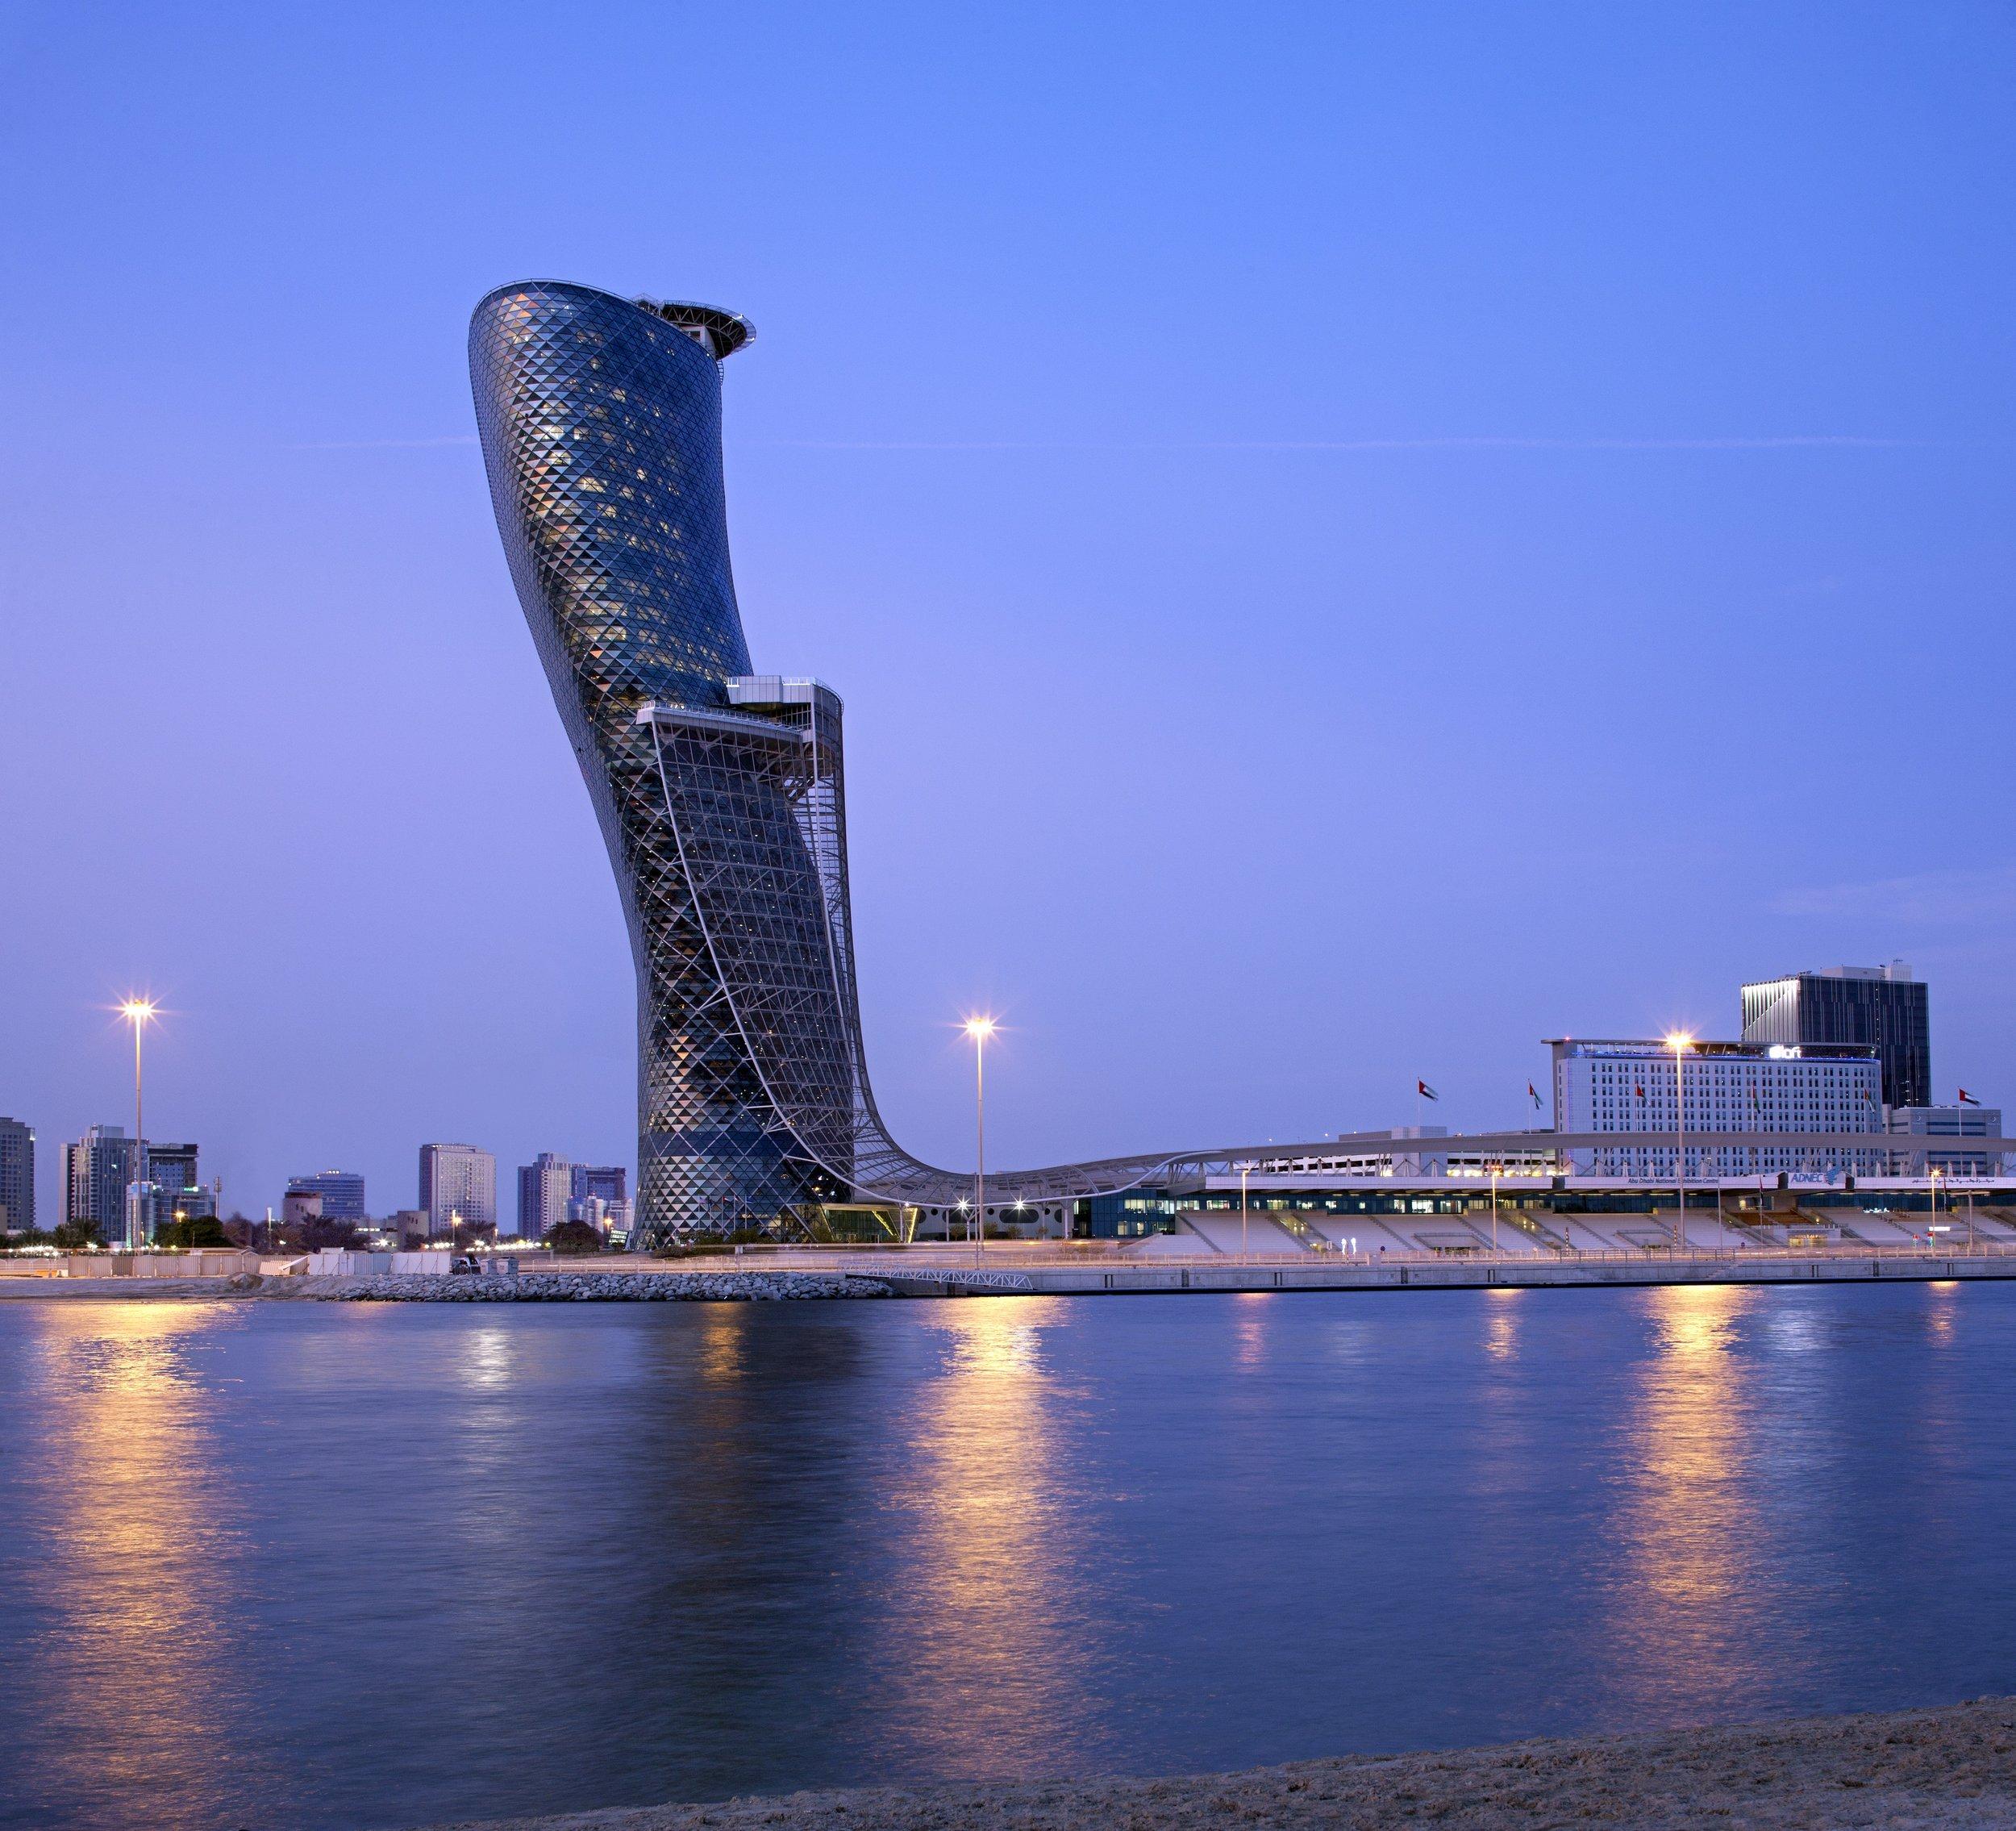 Photo Credit: Andaz Capital Gate Abu Dhabi